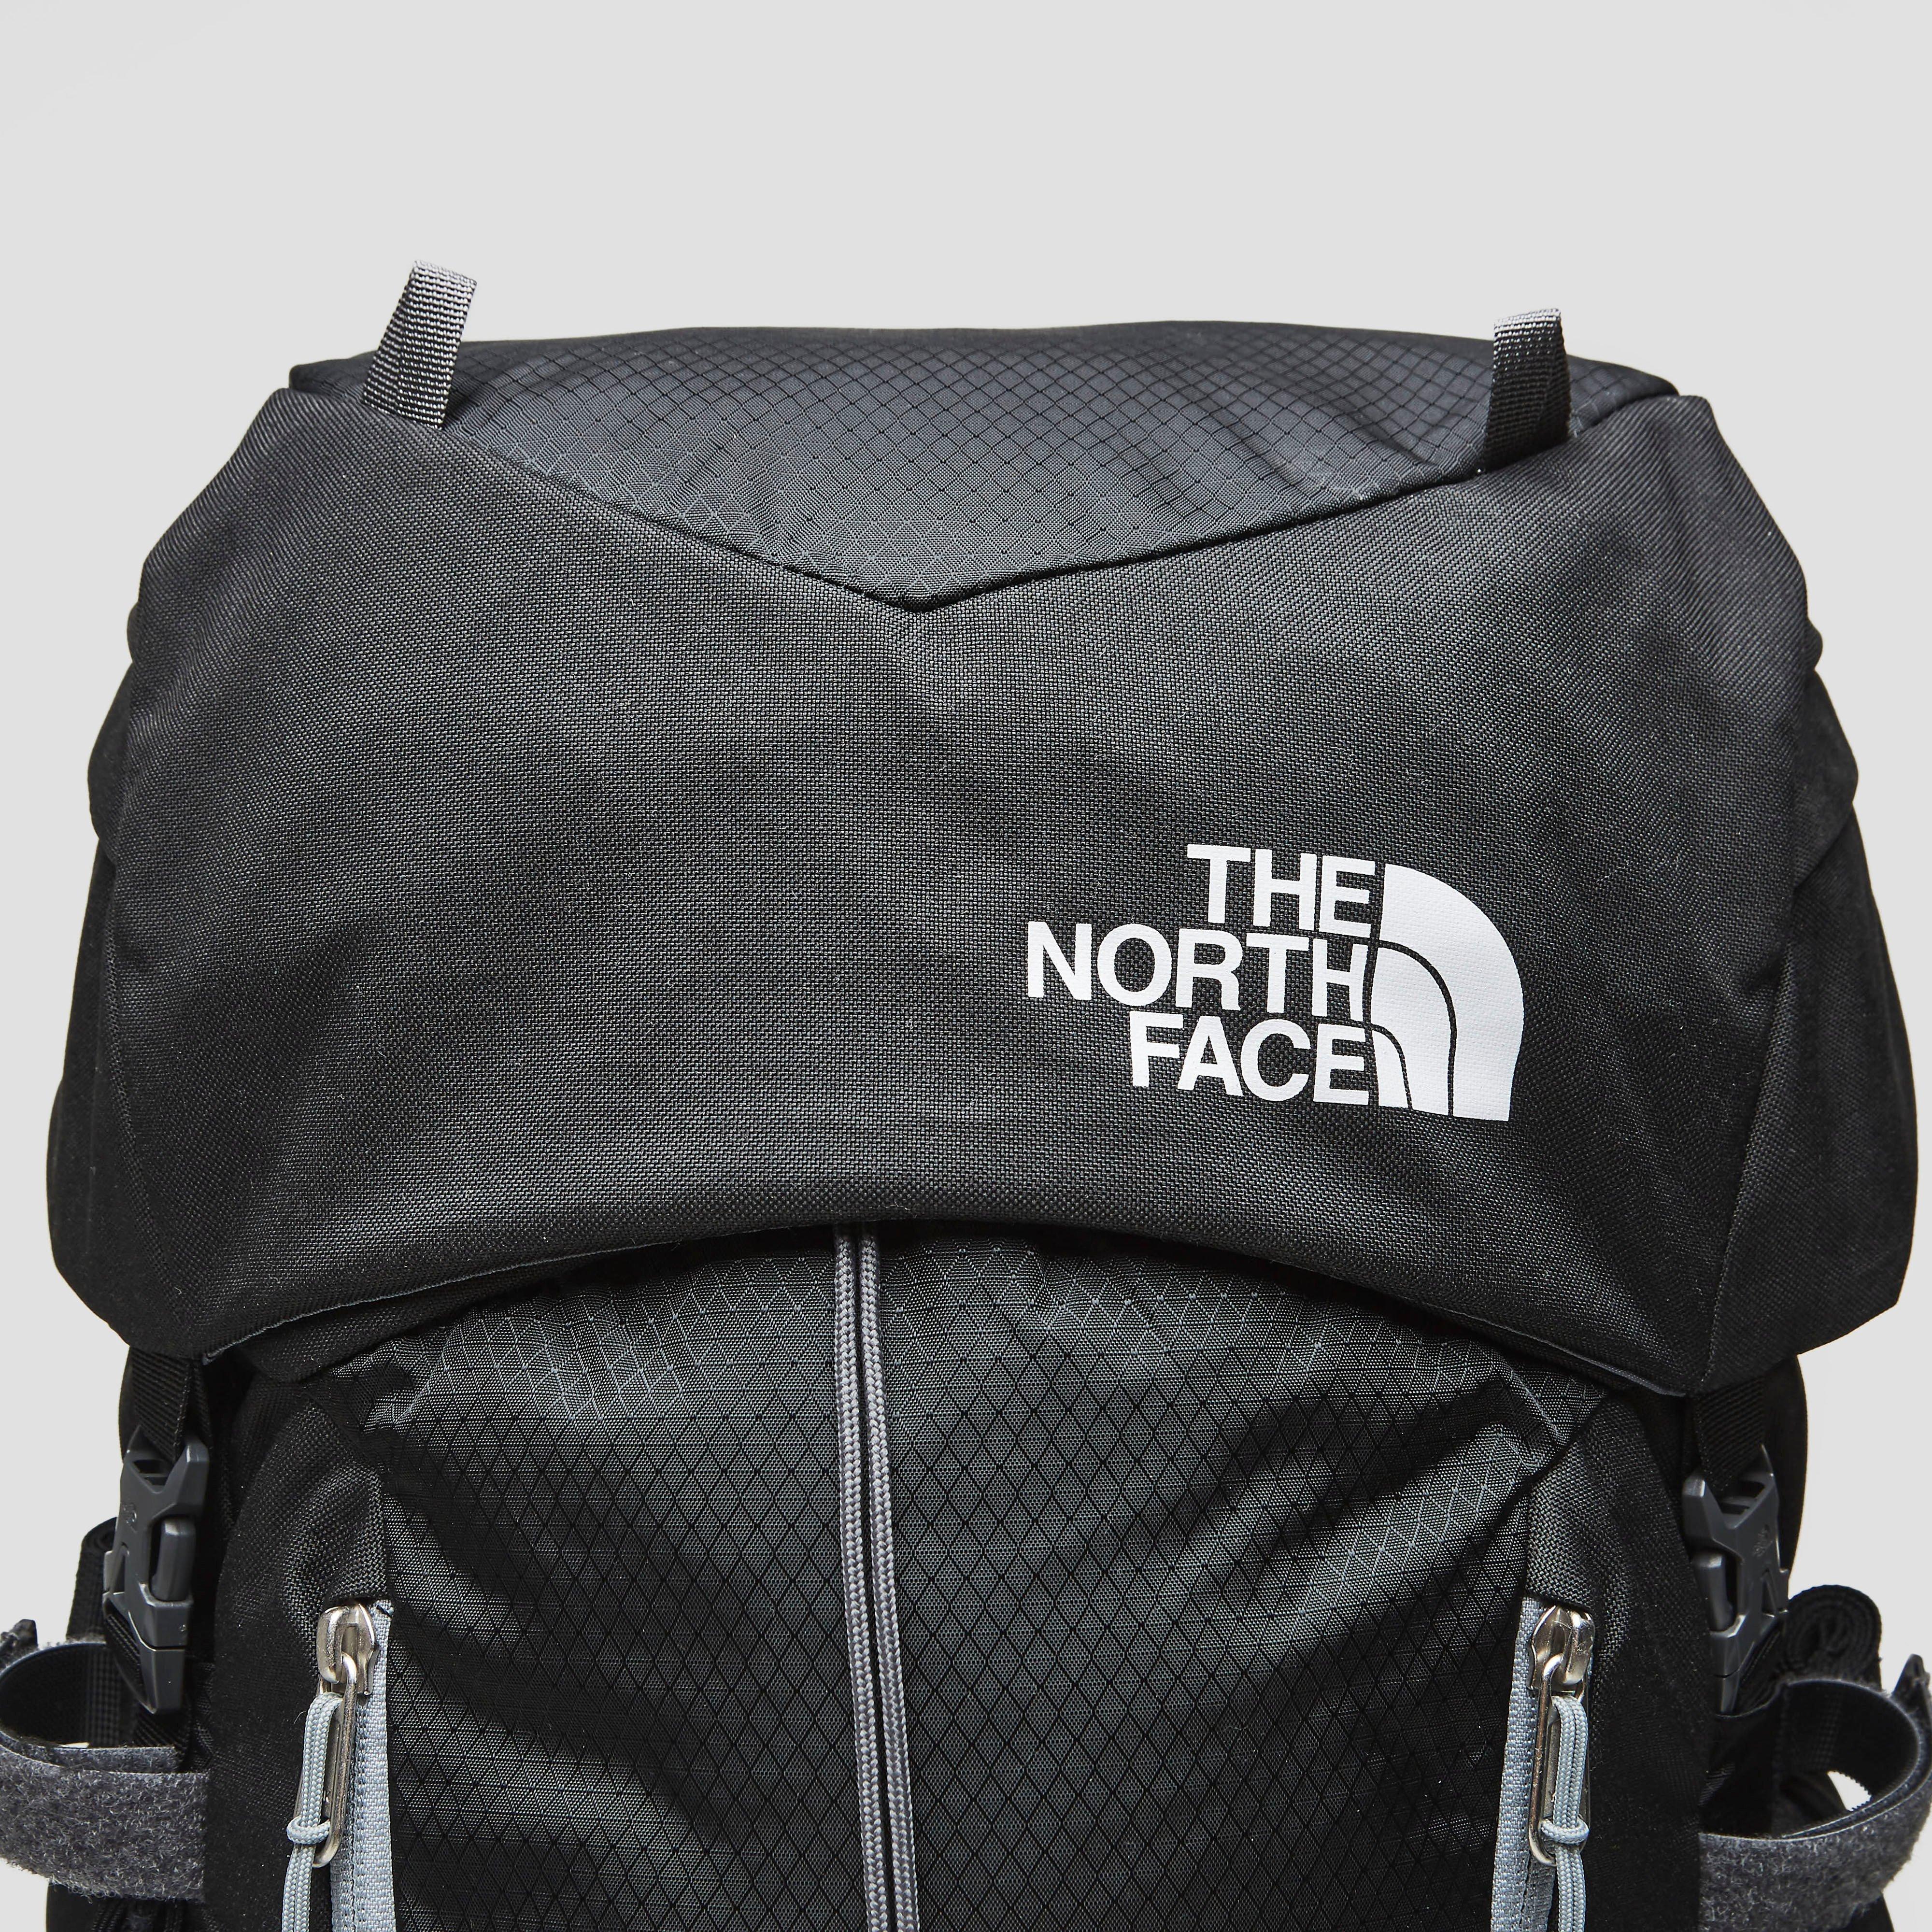 THE NORTH FACE TERRA BACKPACK 50 LITER ZWART